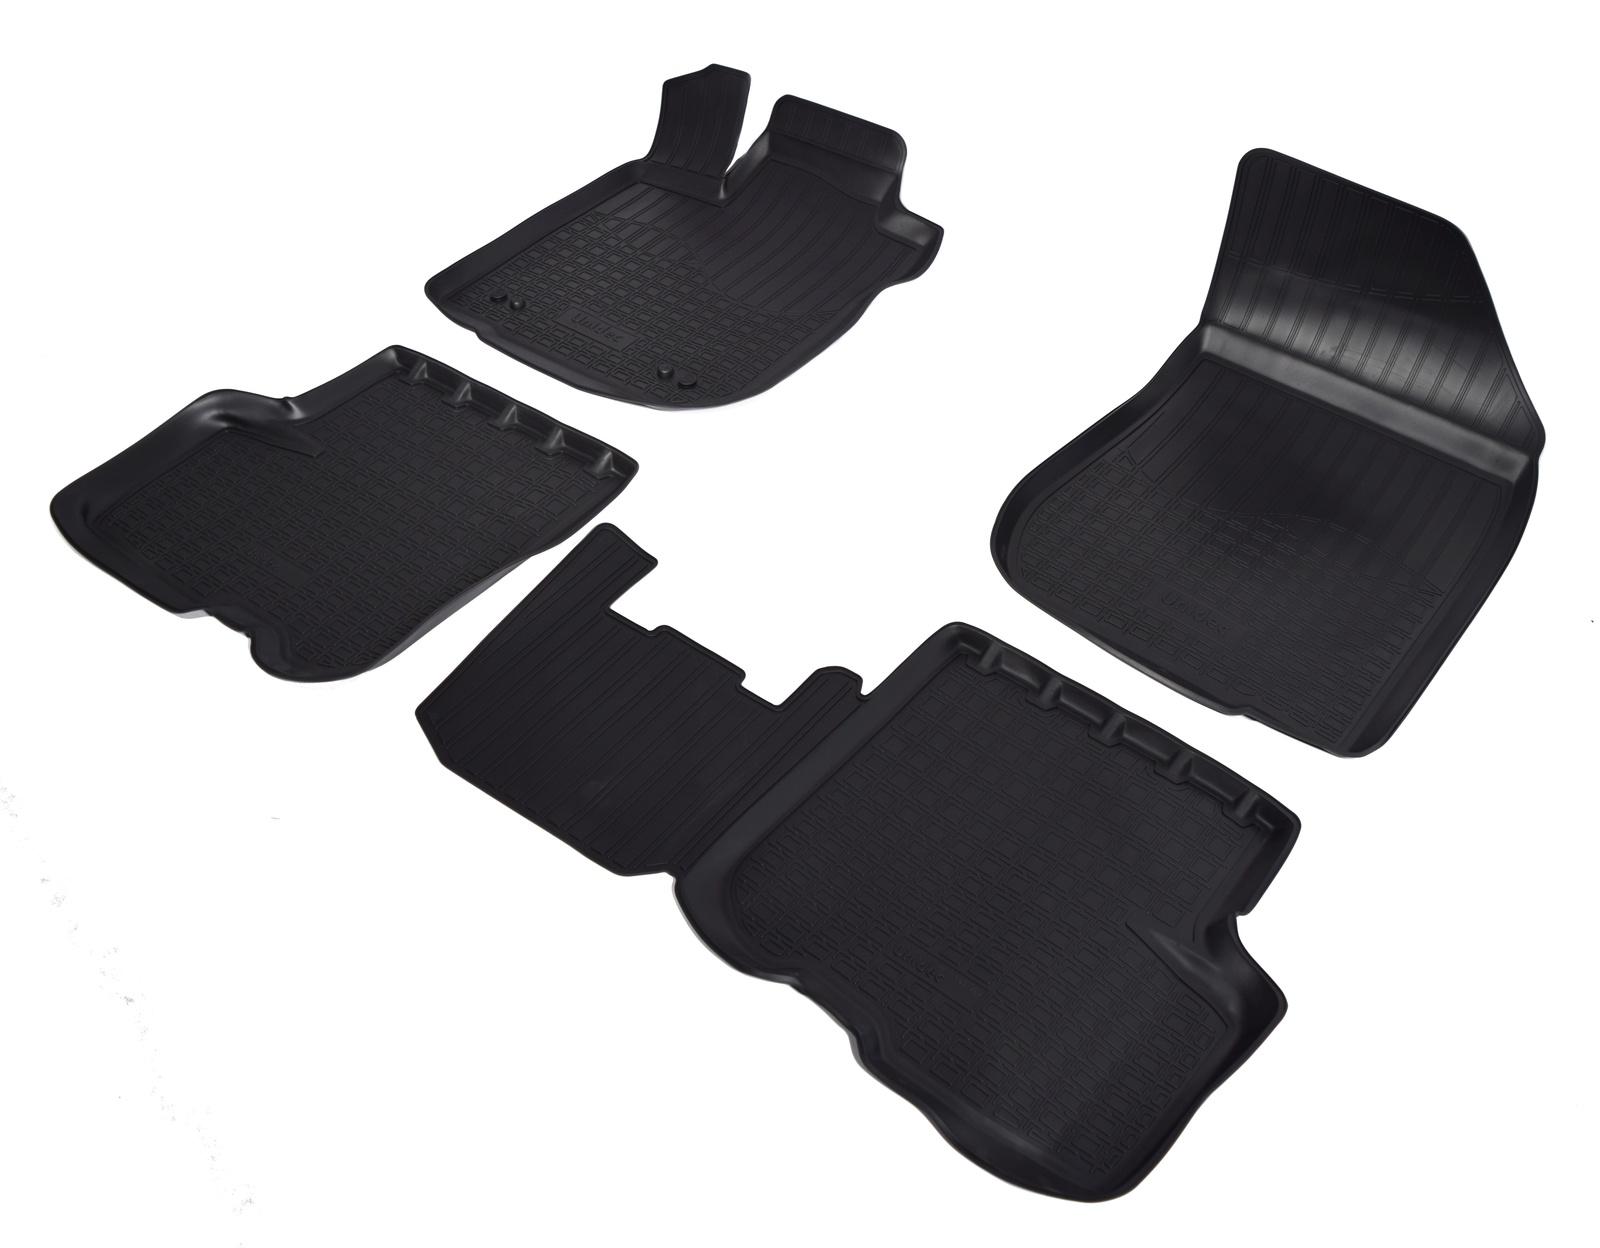 цена на Коврики в салон автомобиля Norplast для Renault Logan L52 2014, NPA11-C69-350, черный